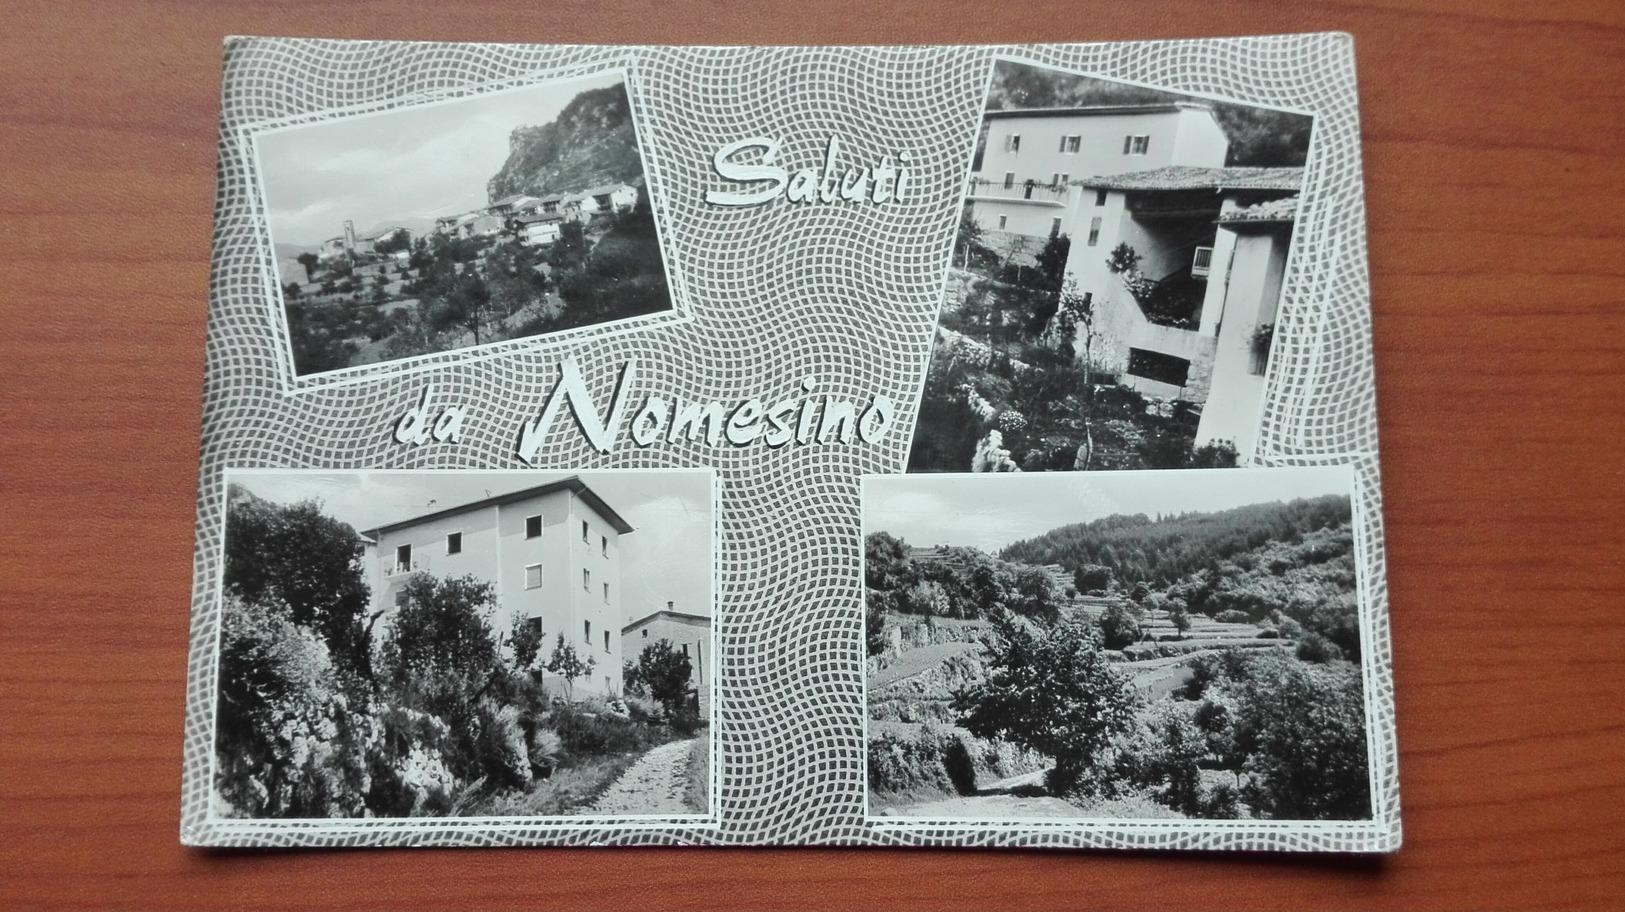 Saluti Da Nomesino - Trento